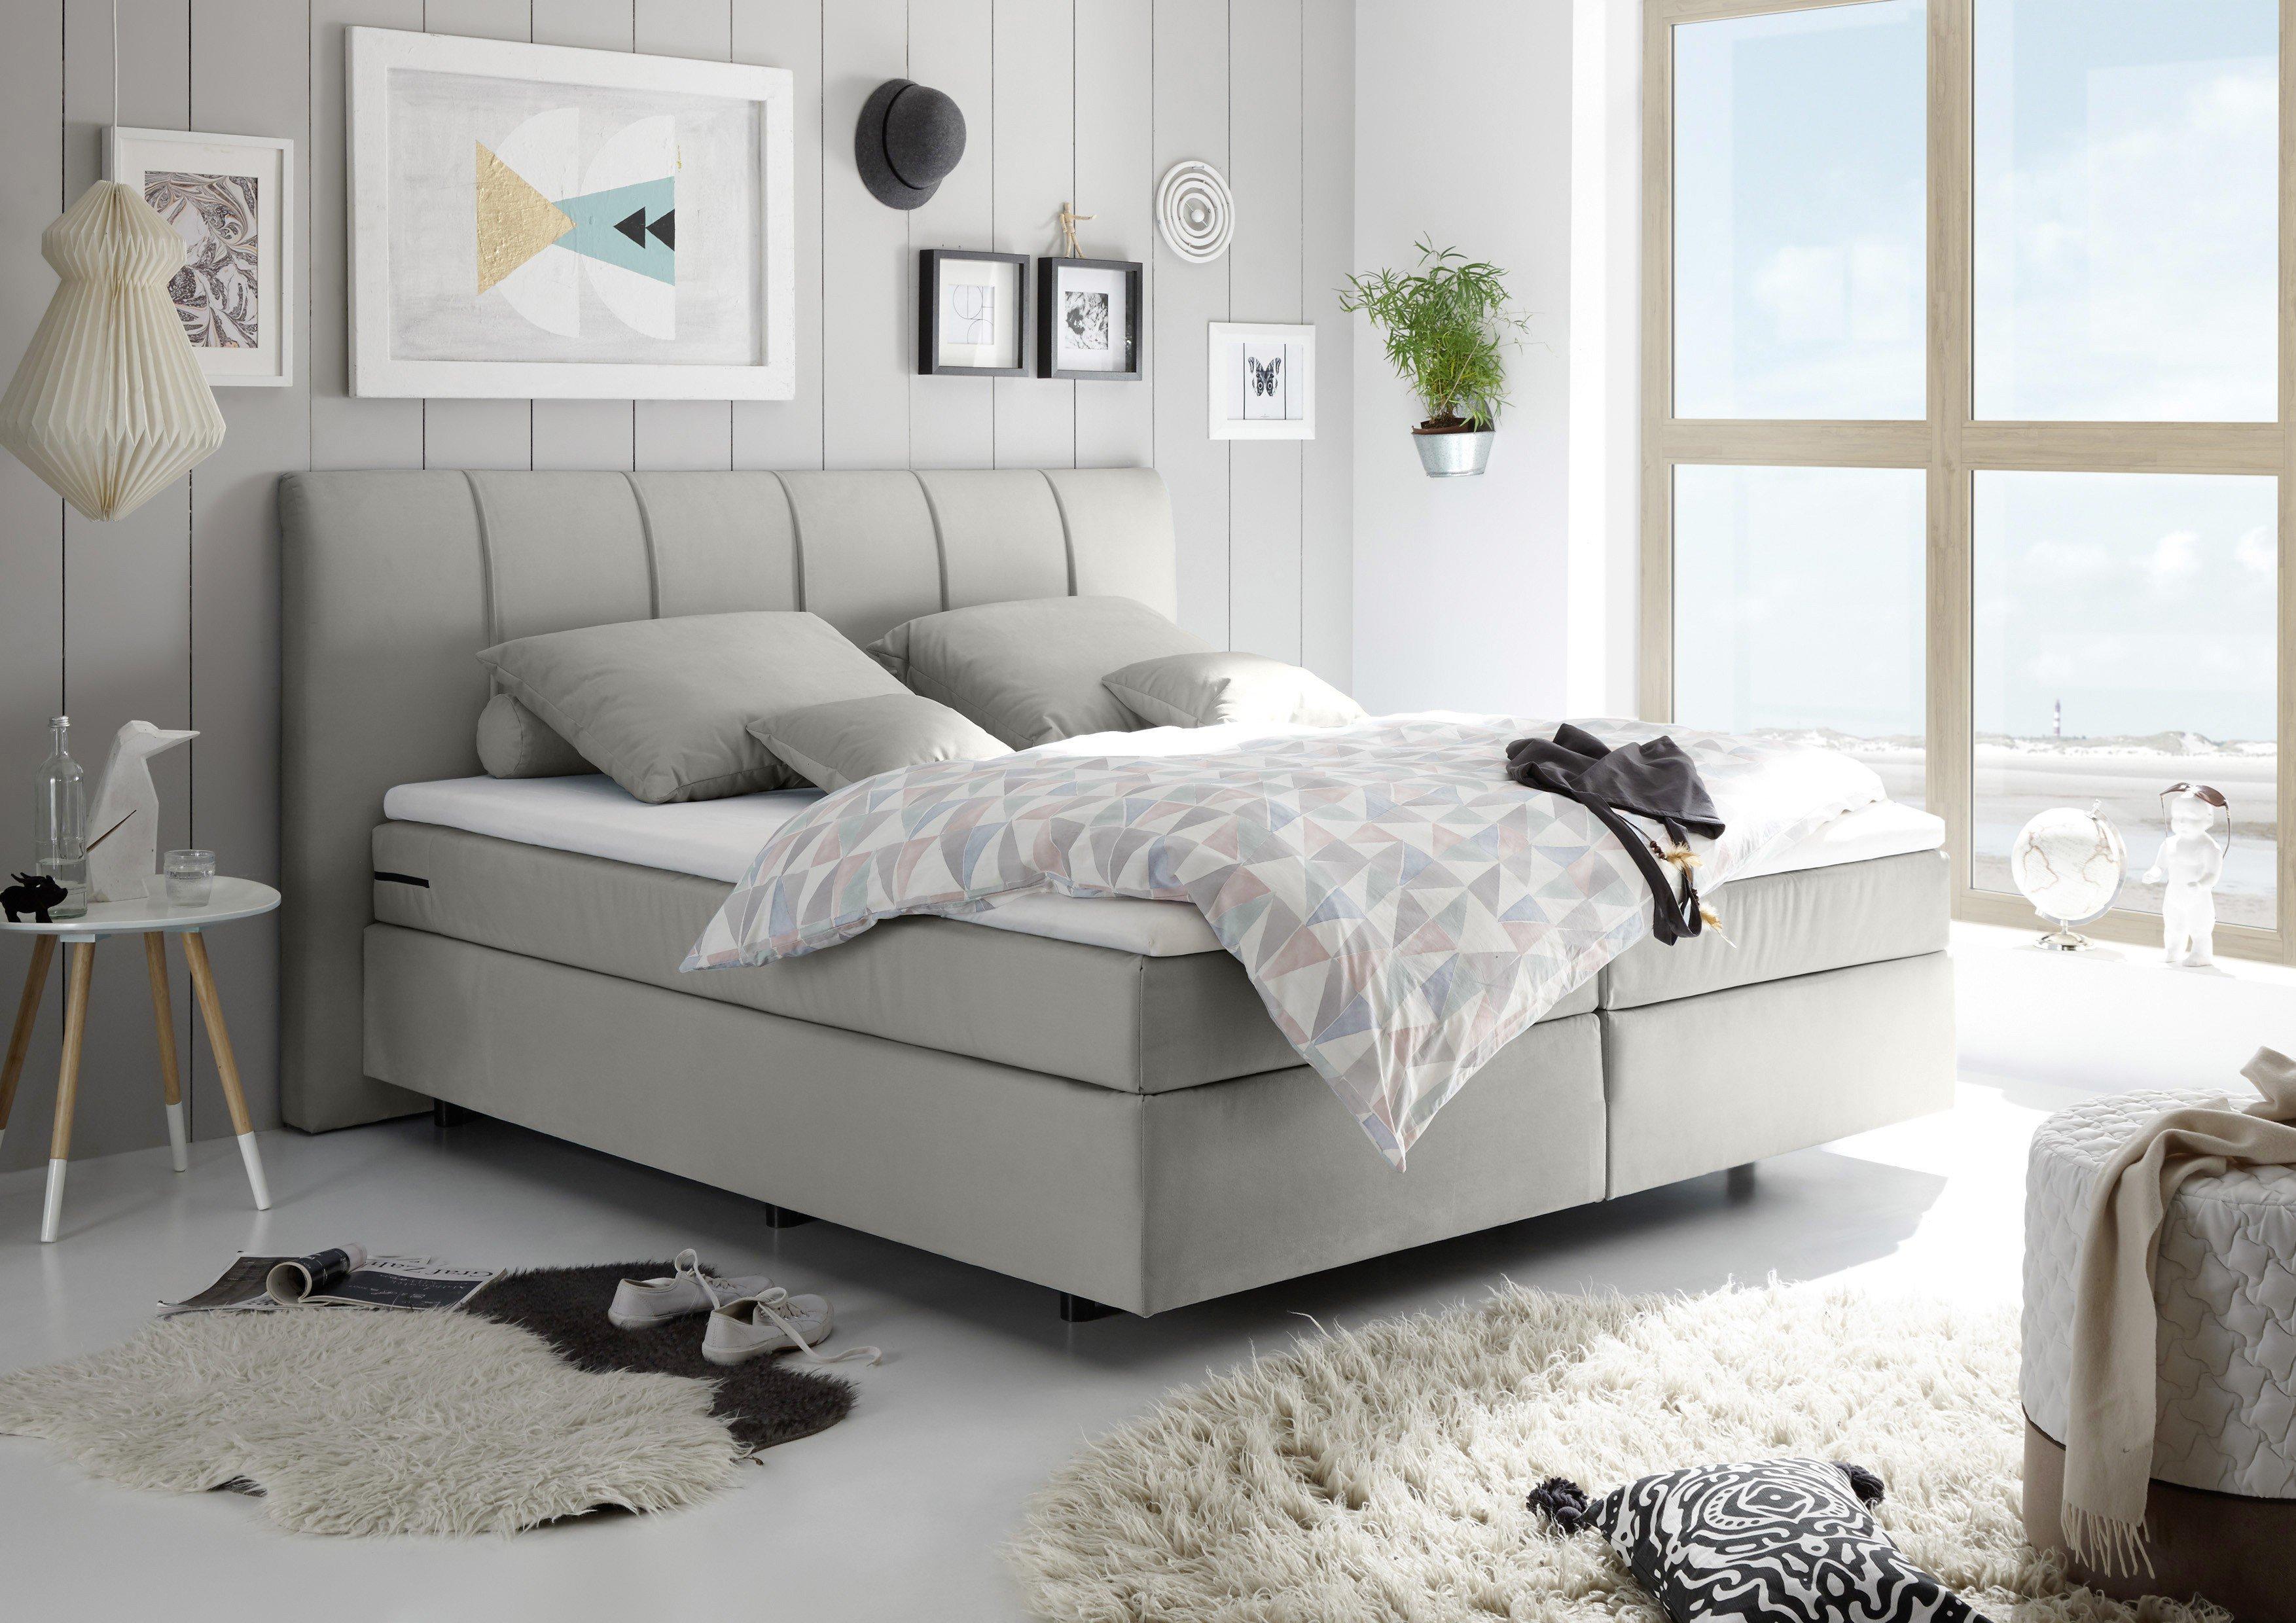 boxspringbett taos von black red white in grau m bel. Black Bedroom Furniture Sets. Home Design Ideas